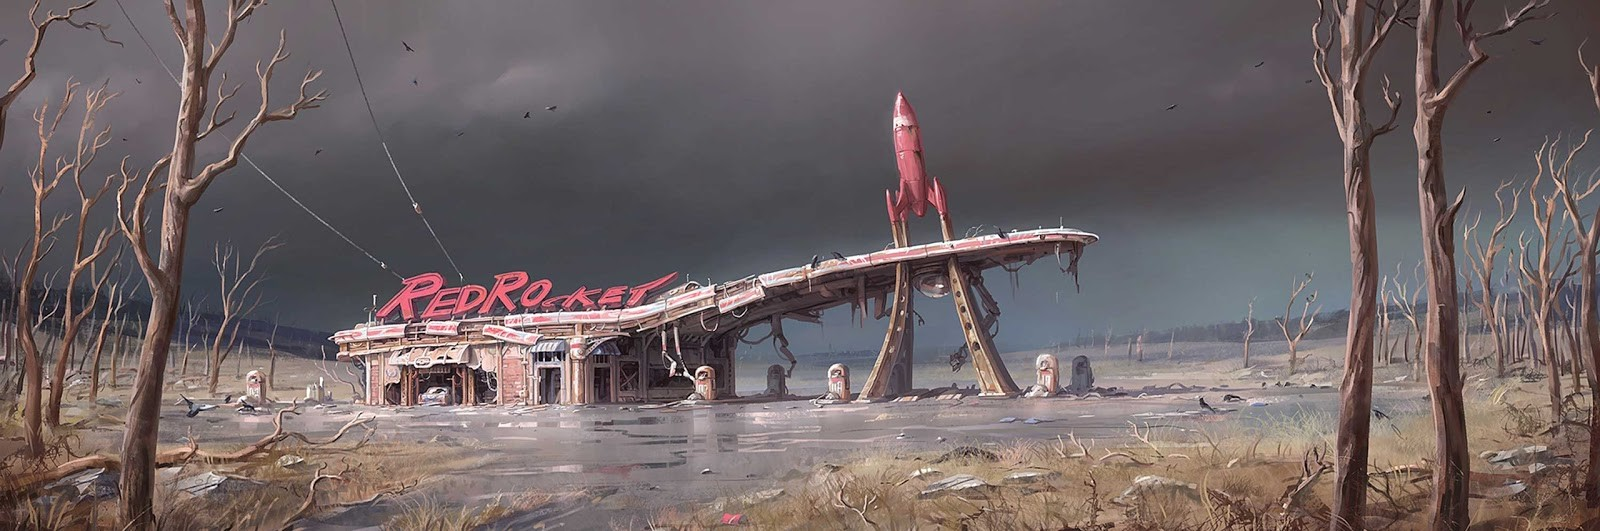 Fallout 4 Concept Art by Ilya Nazarov (18 pics)